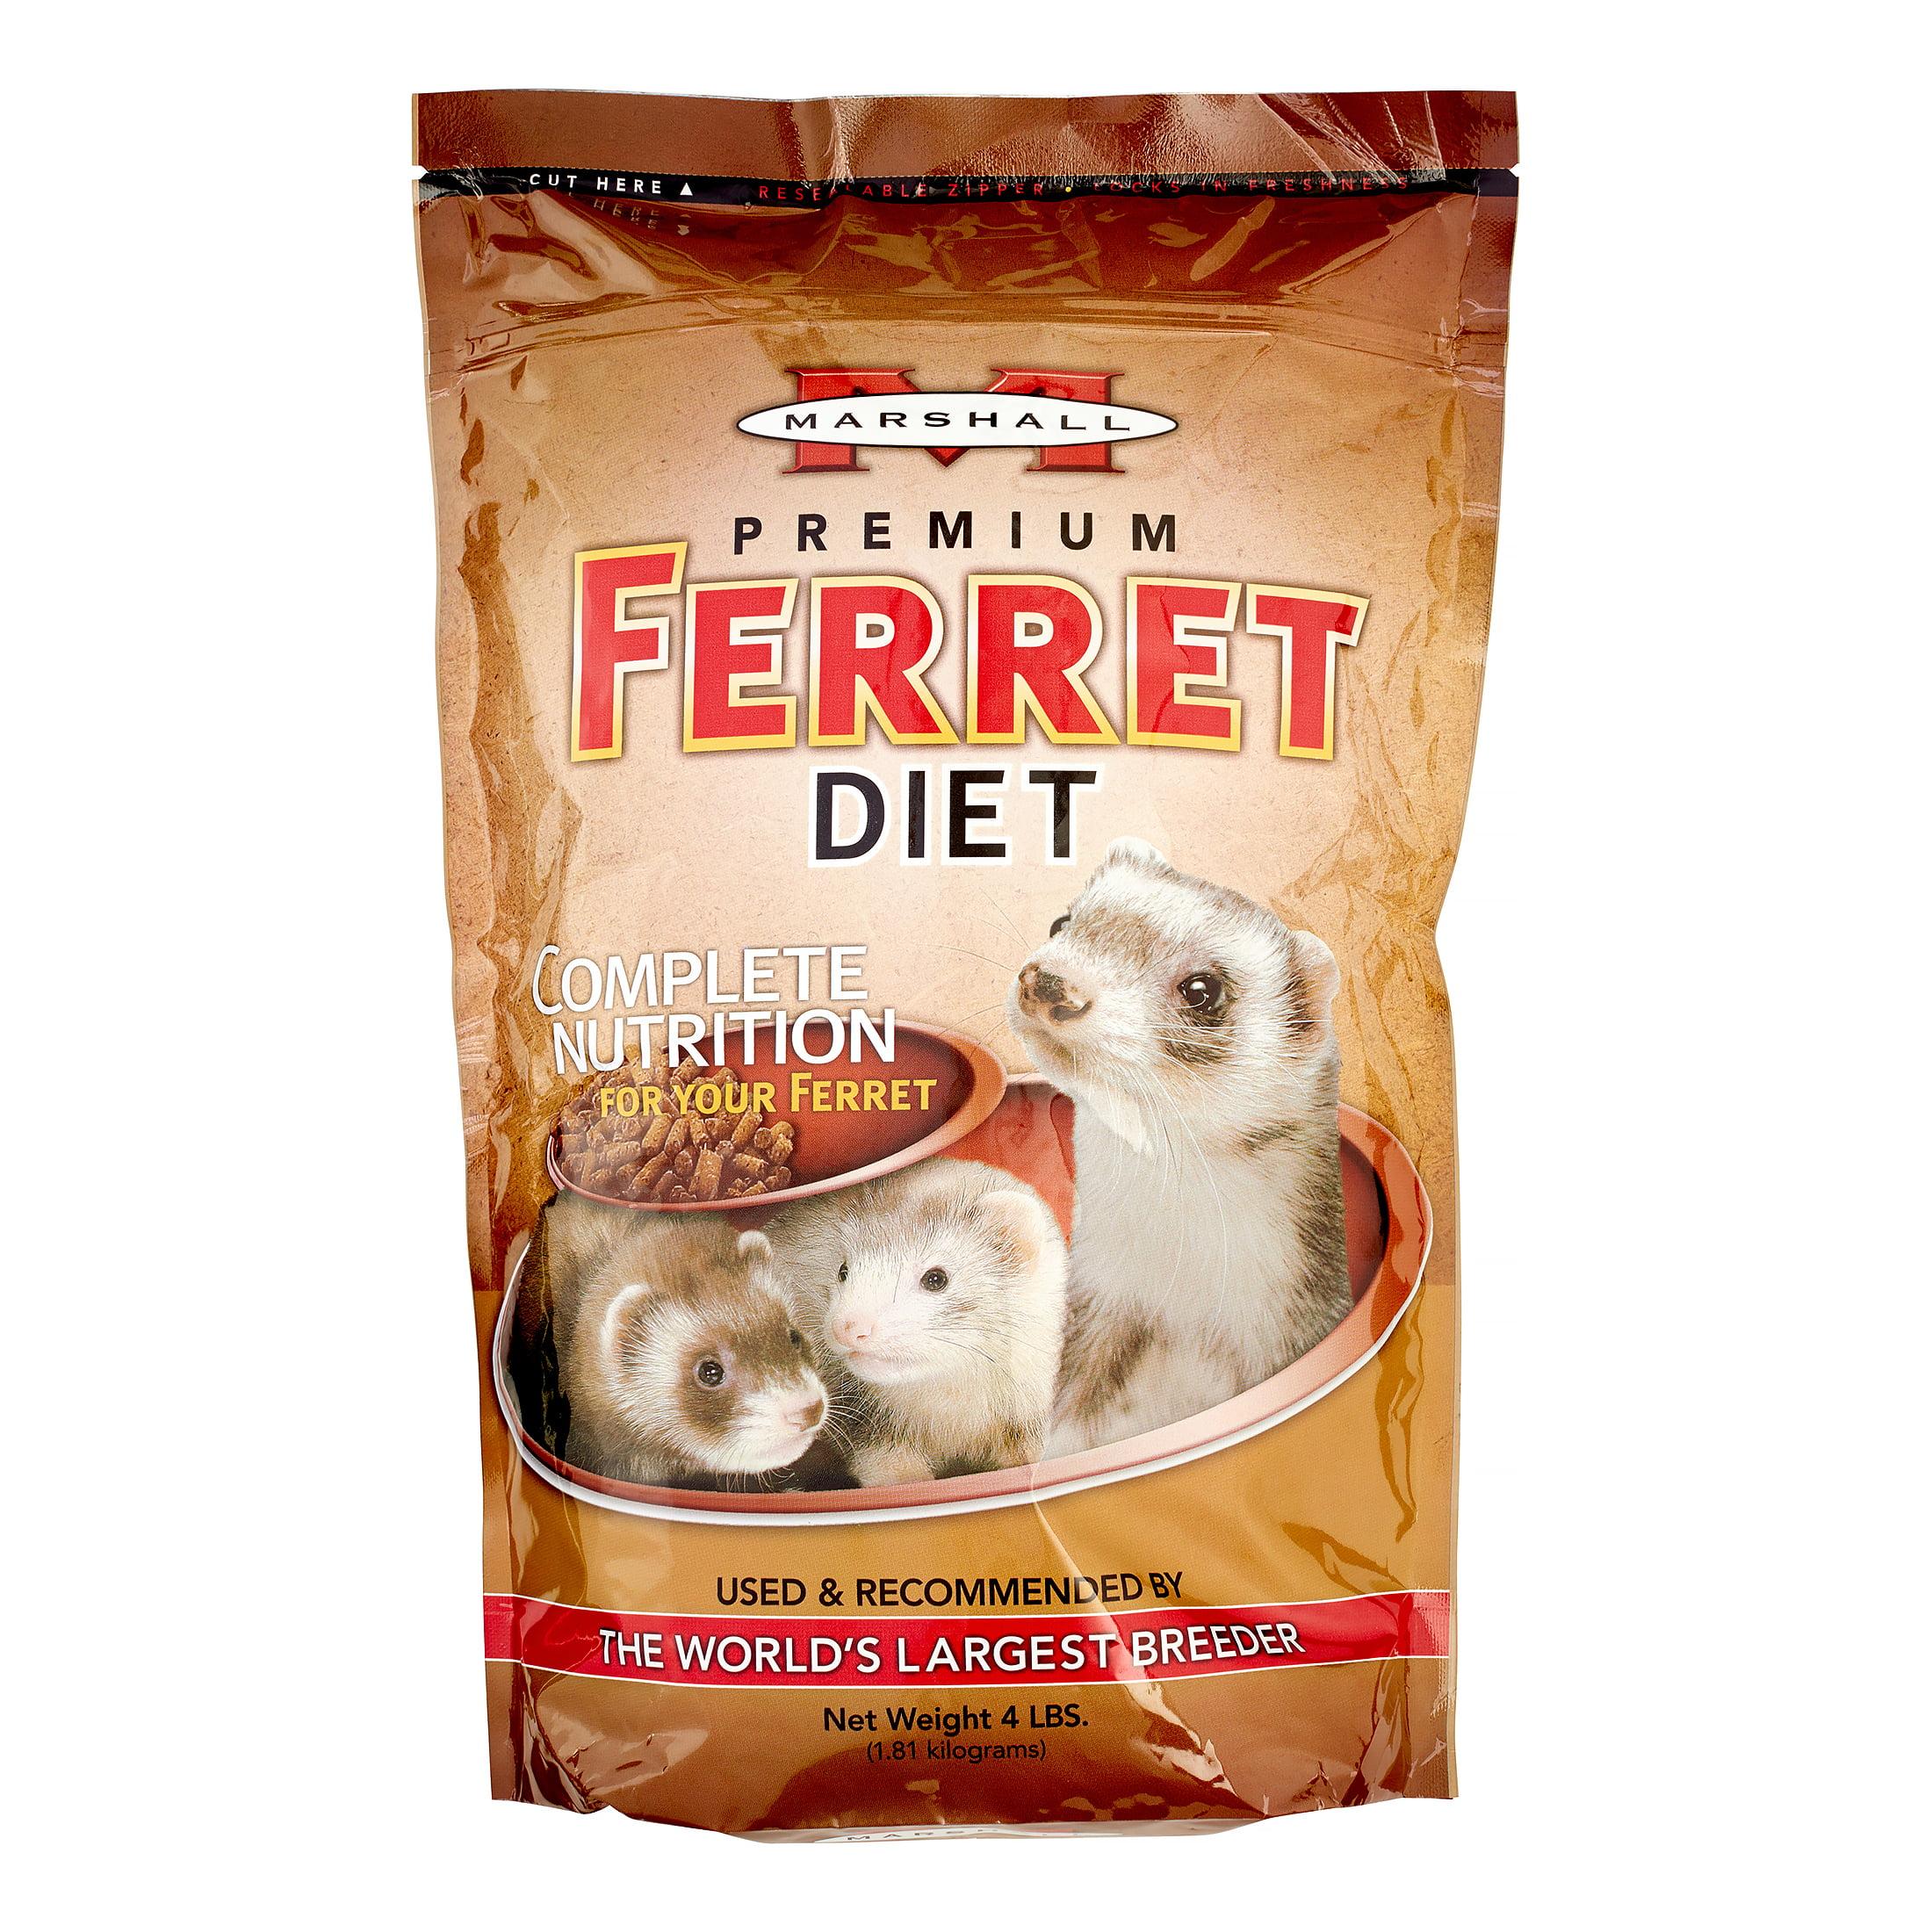 Marshall Premium Ferret Litter net weight 10 lbs